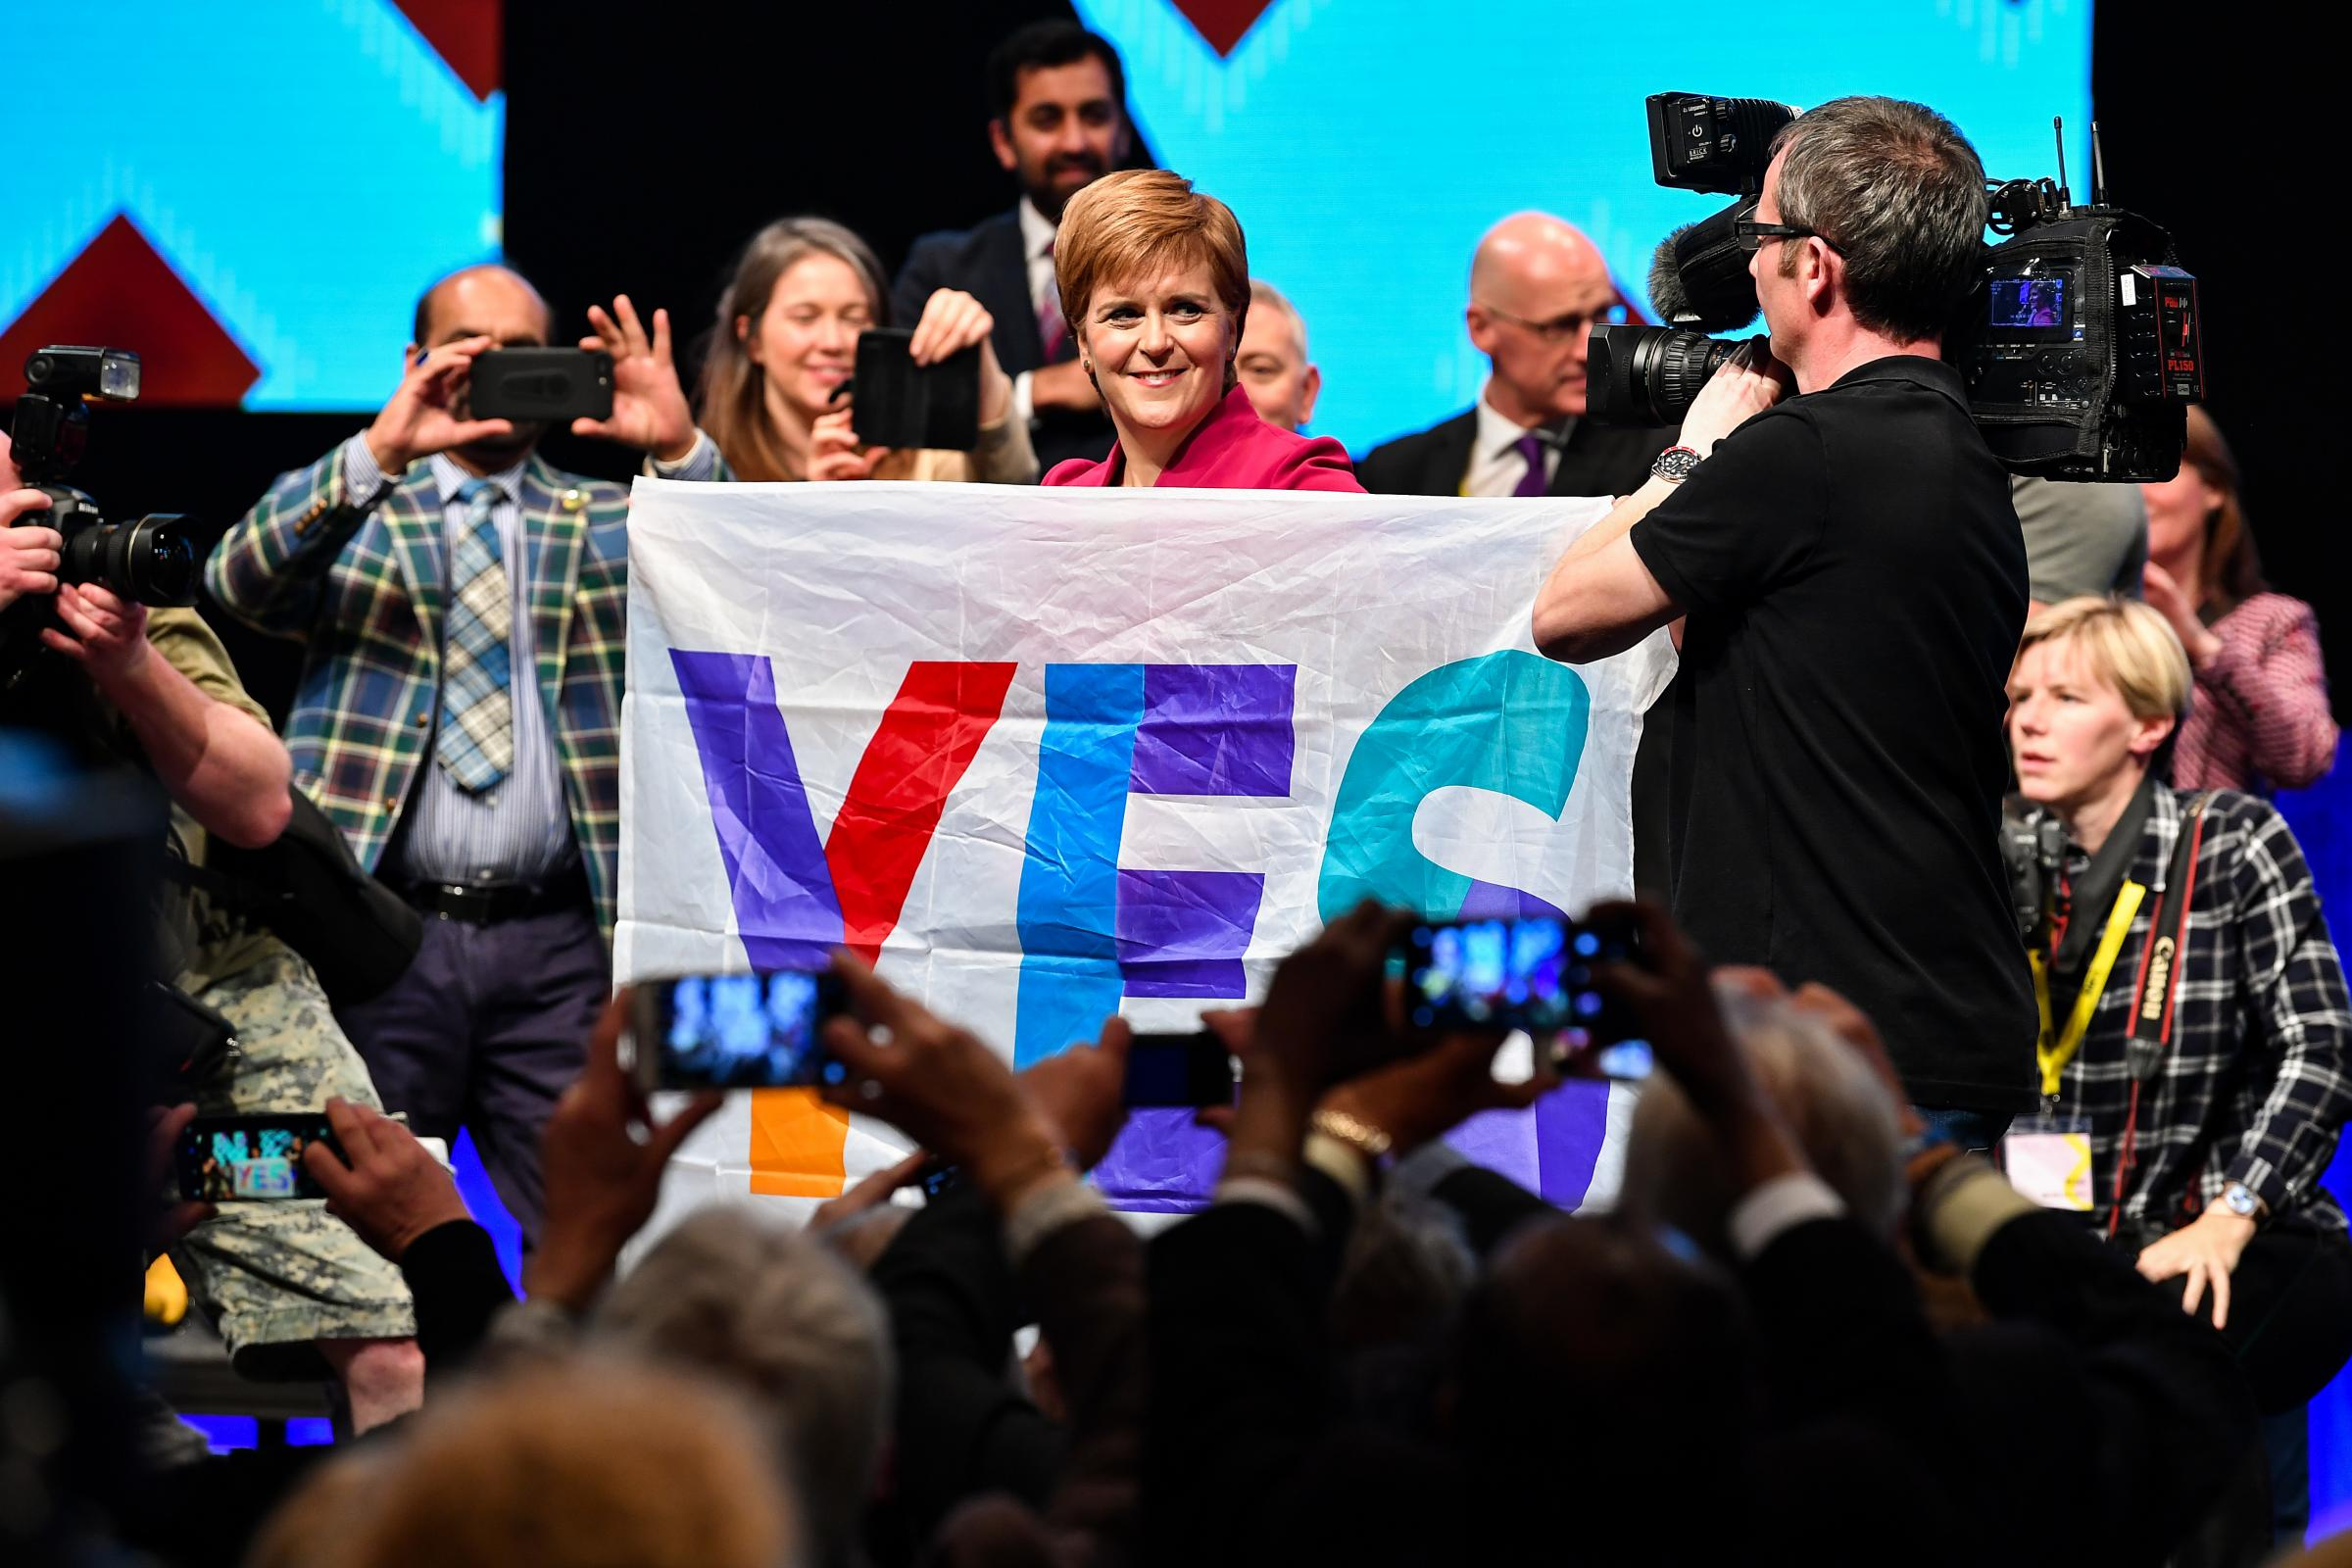 Nicola Sturgeon wants a second referendum in 2020